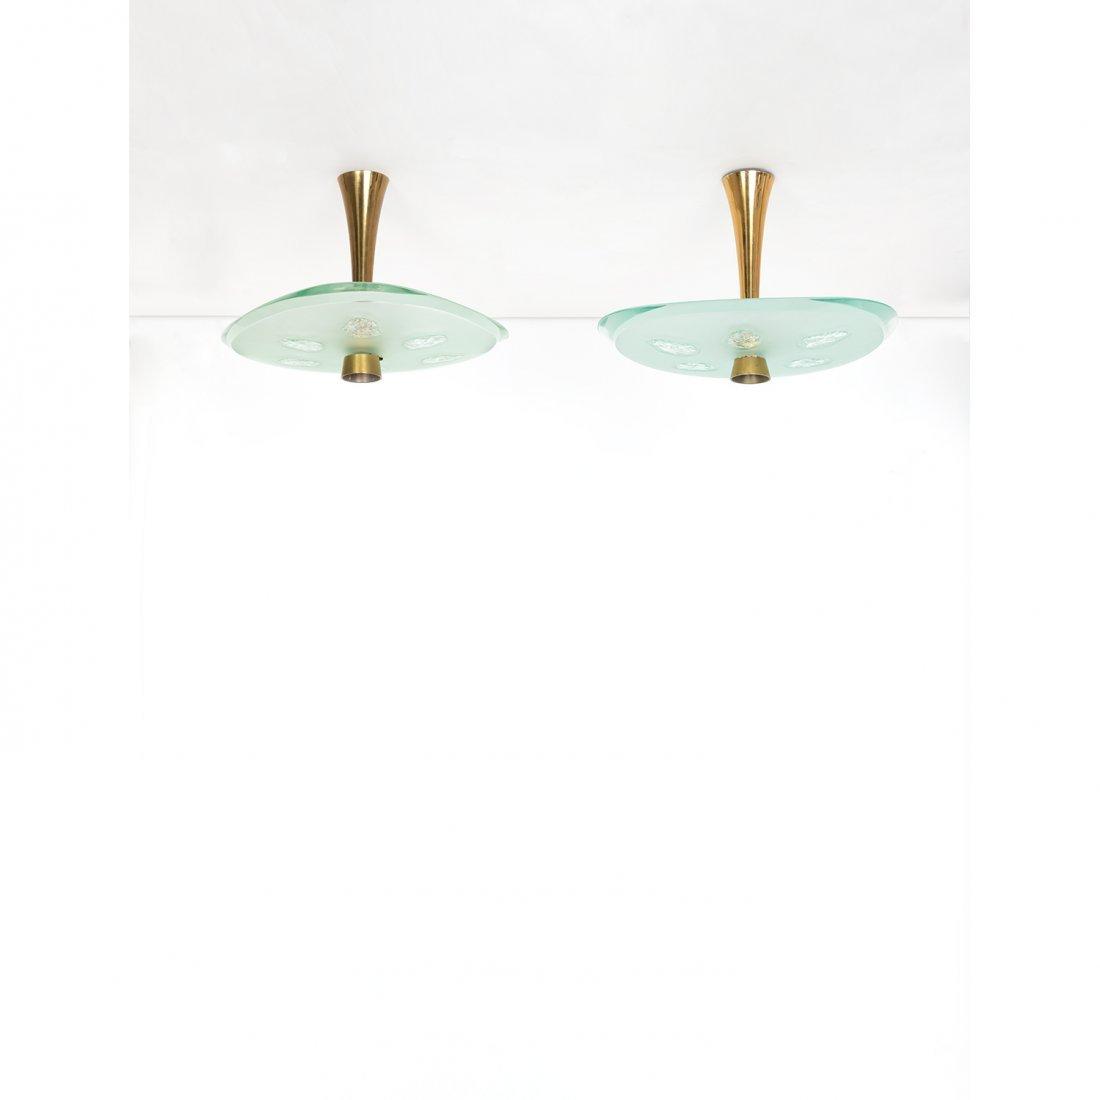 Max Ingrand (1908-1969) Model no. 1748 Pair of ceiling